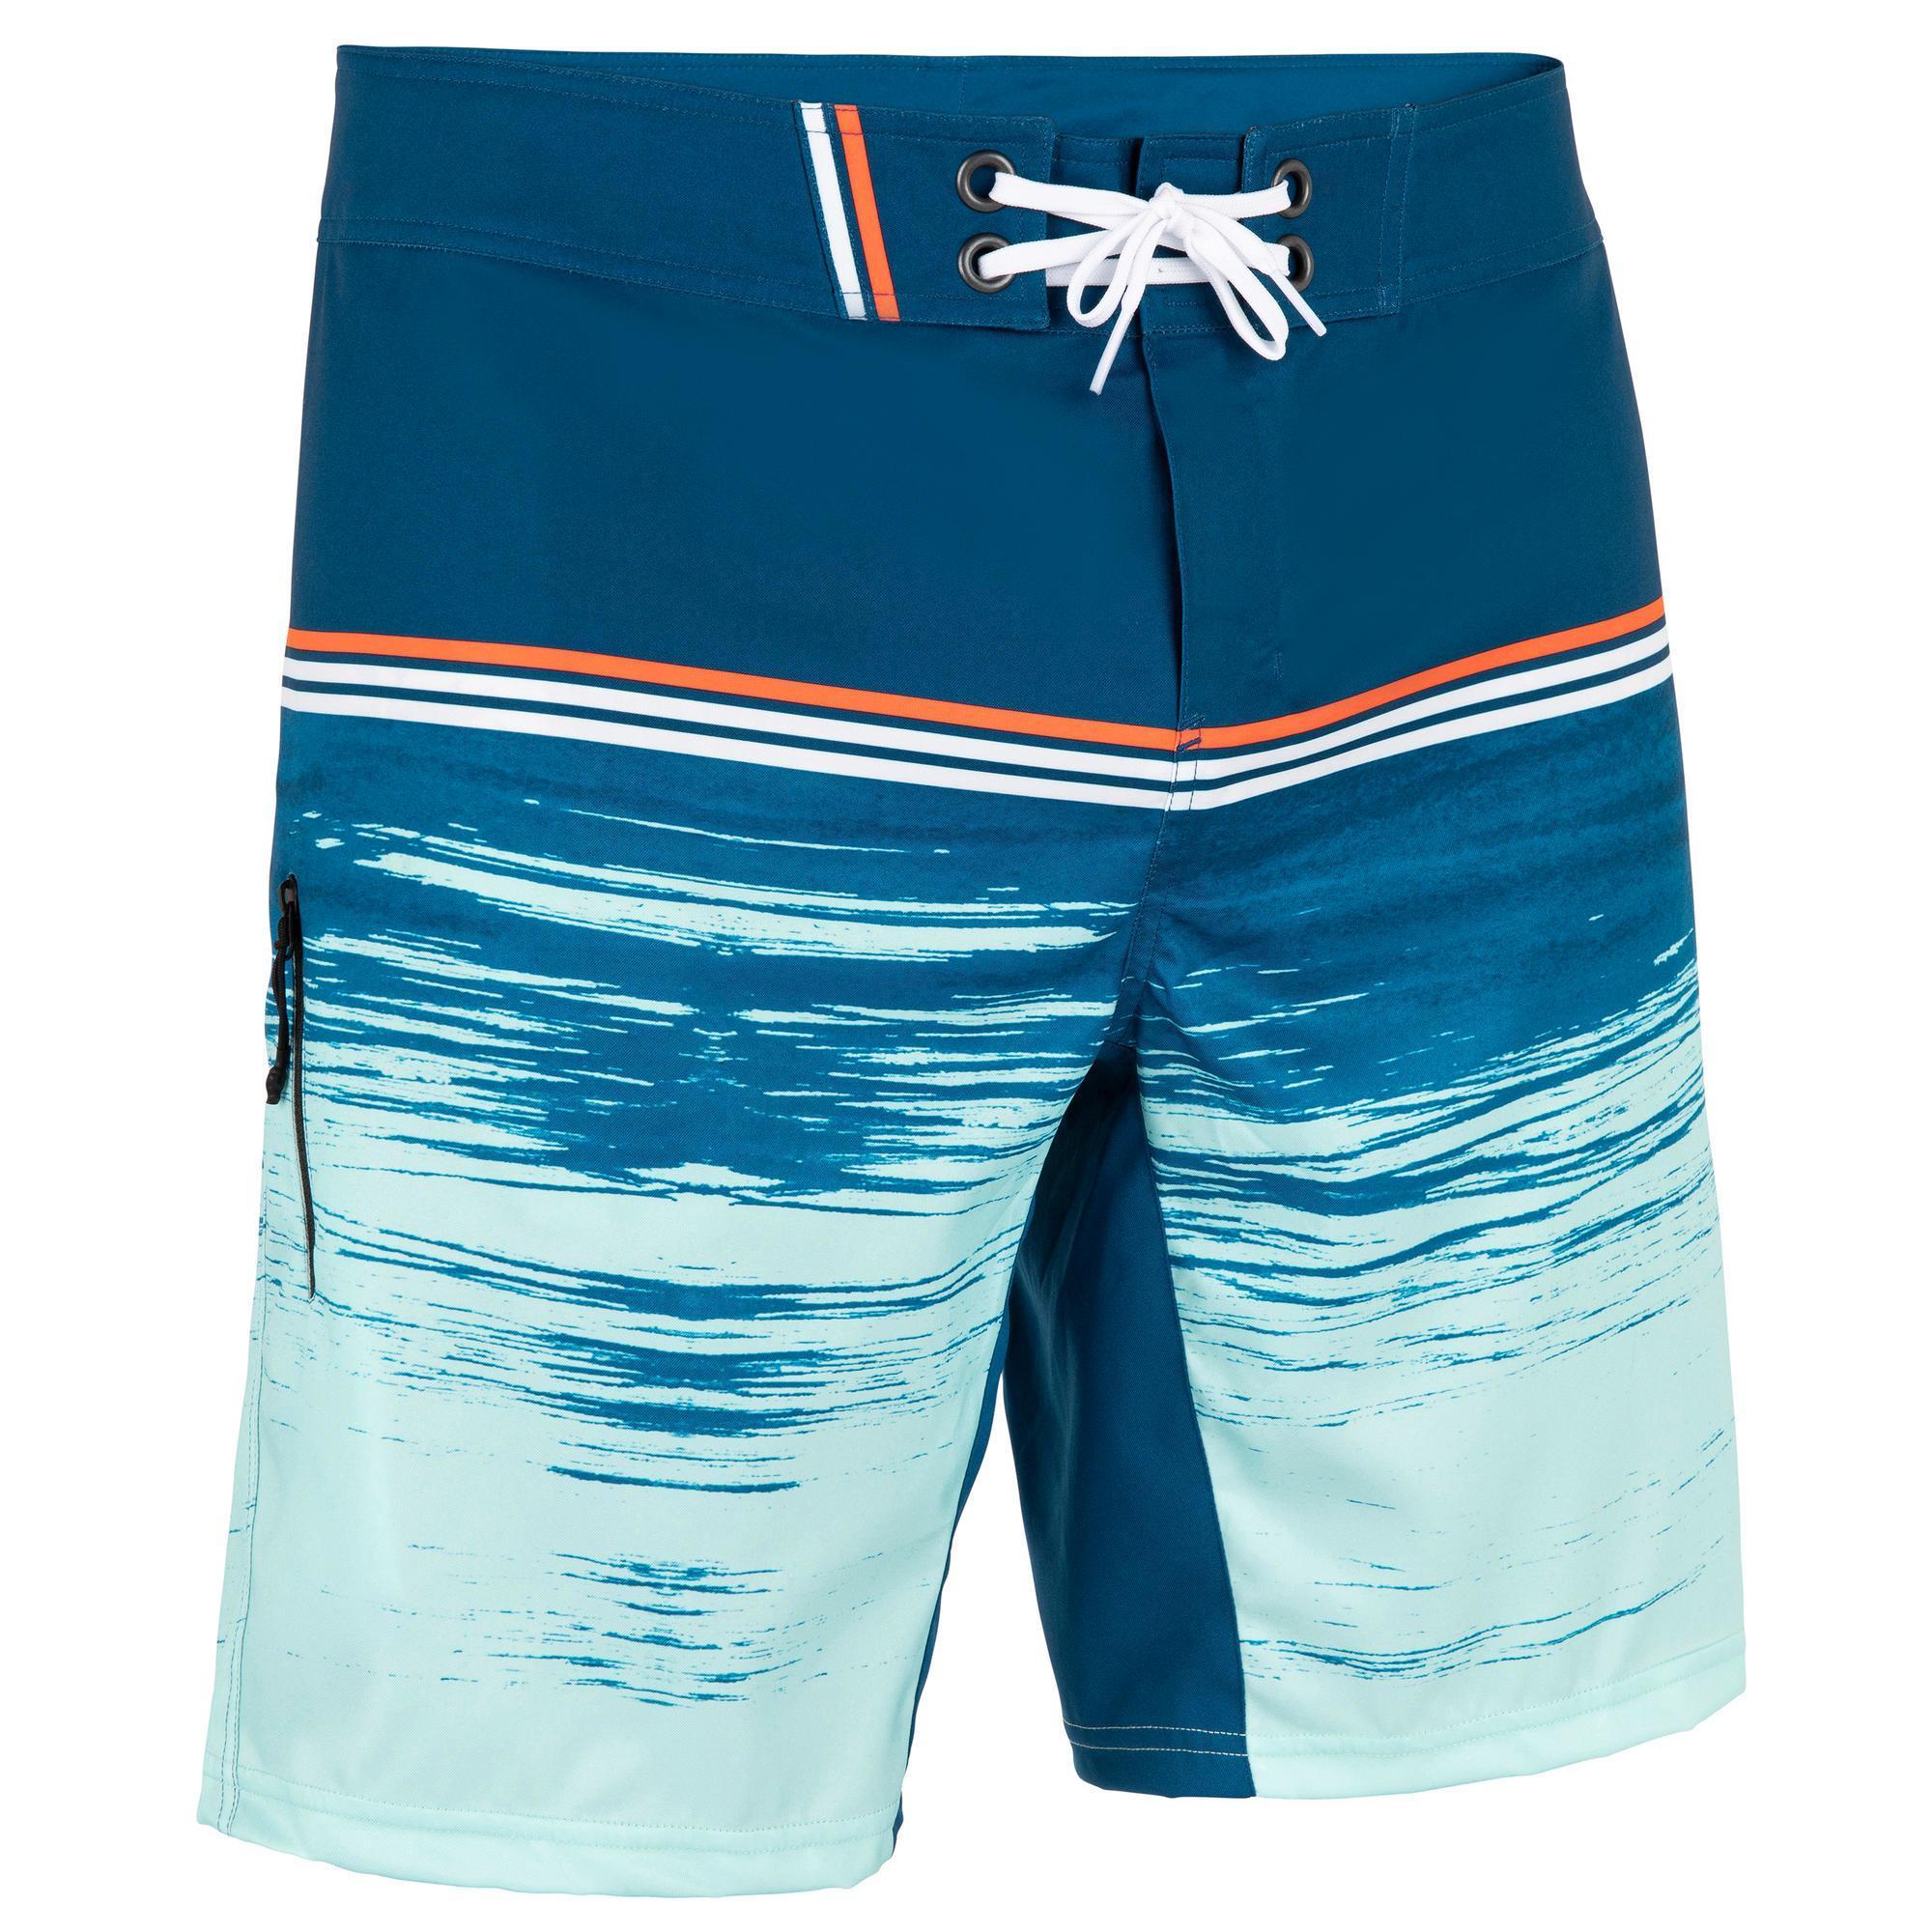 Boardshorts Surfen Standard 500S Gradient | Bekleidung > Bademode > Boardshorts | Olaian